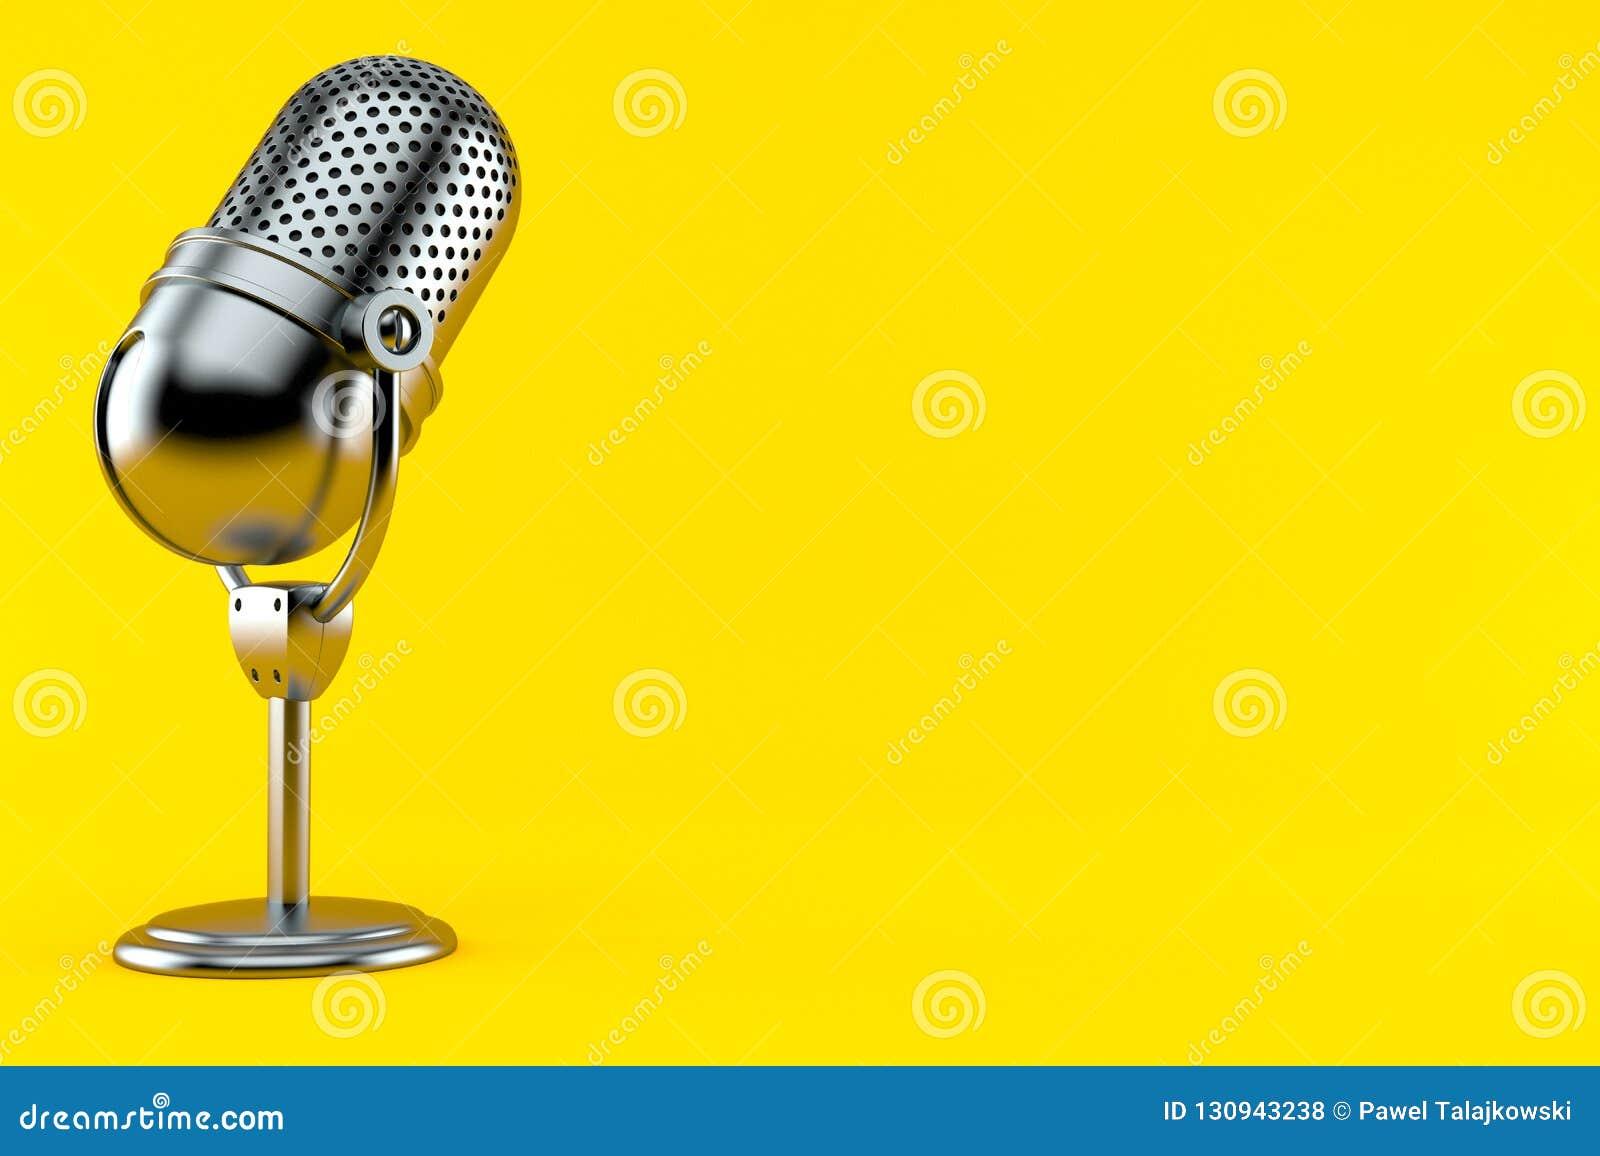 Radiowy mikrofon